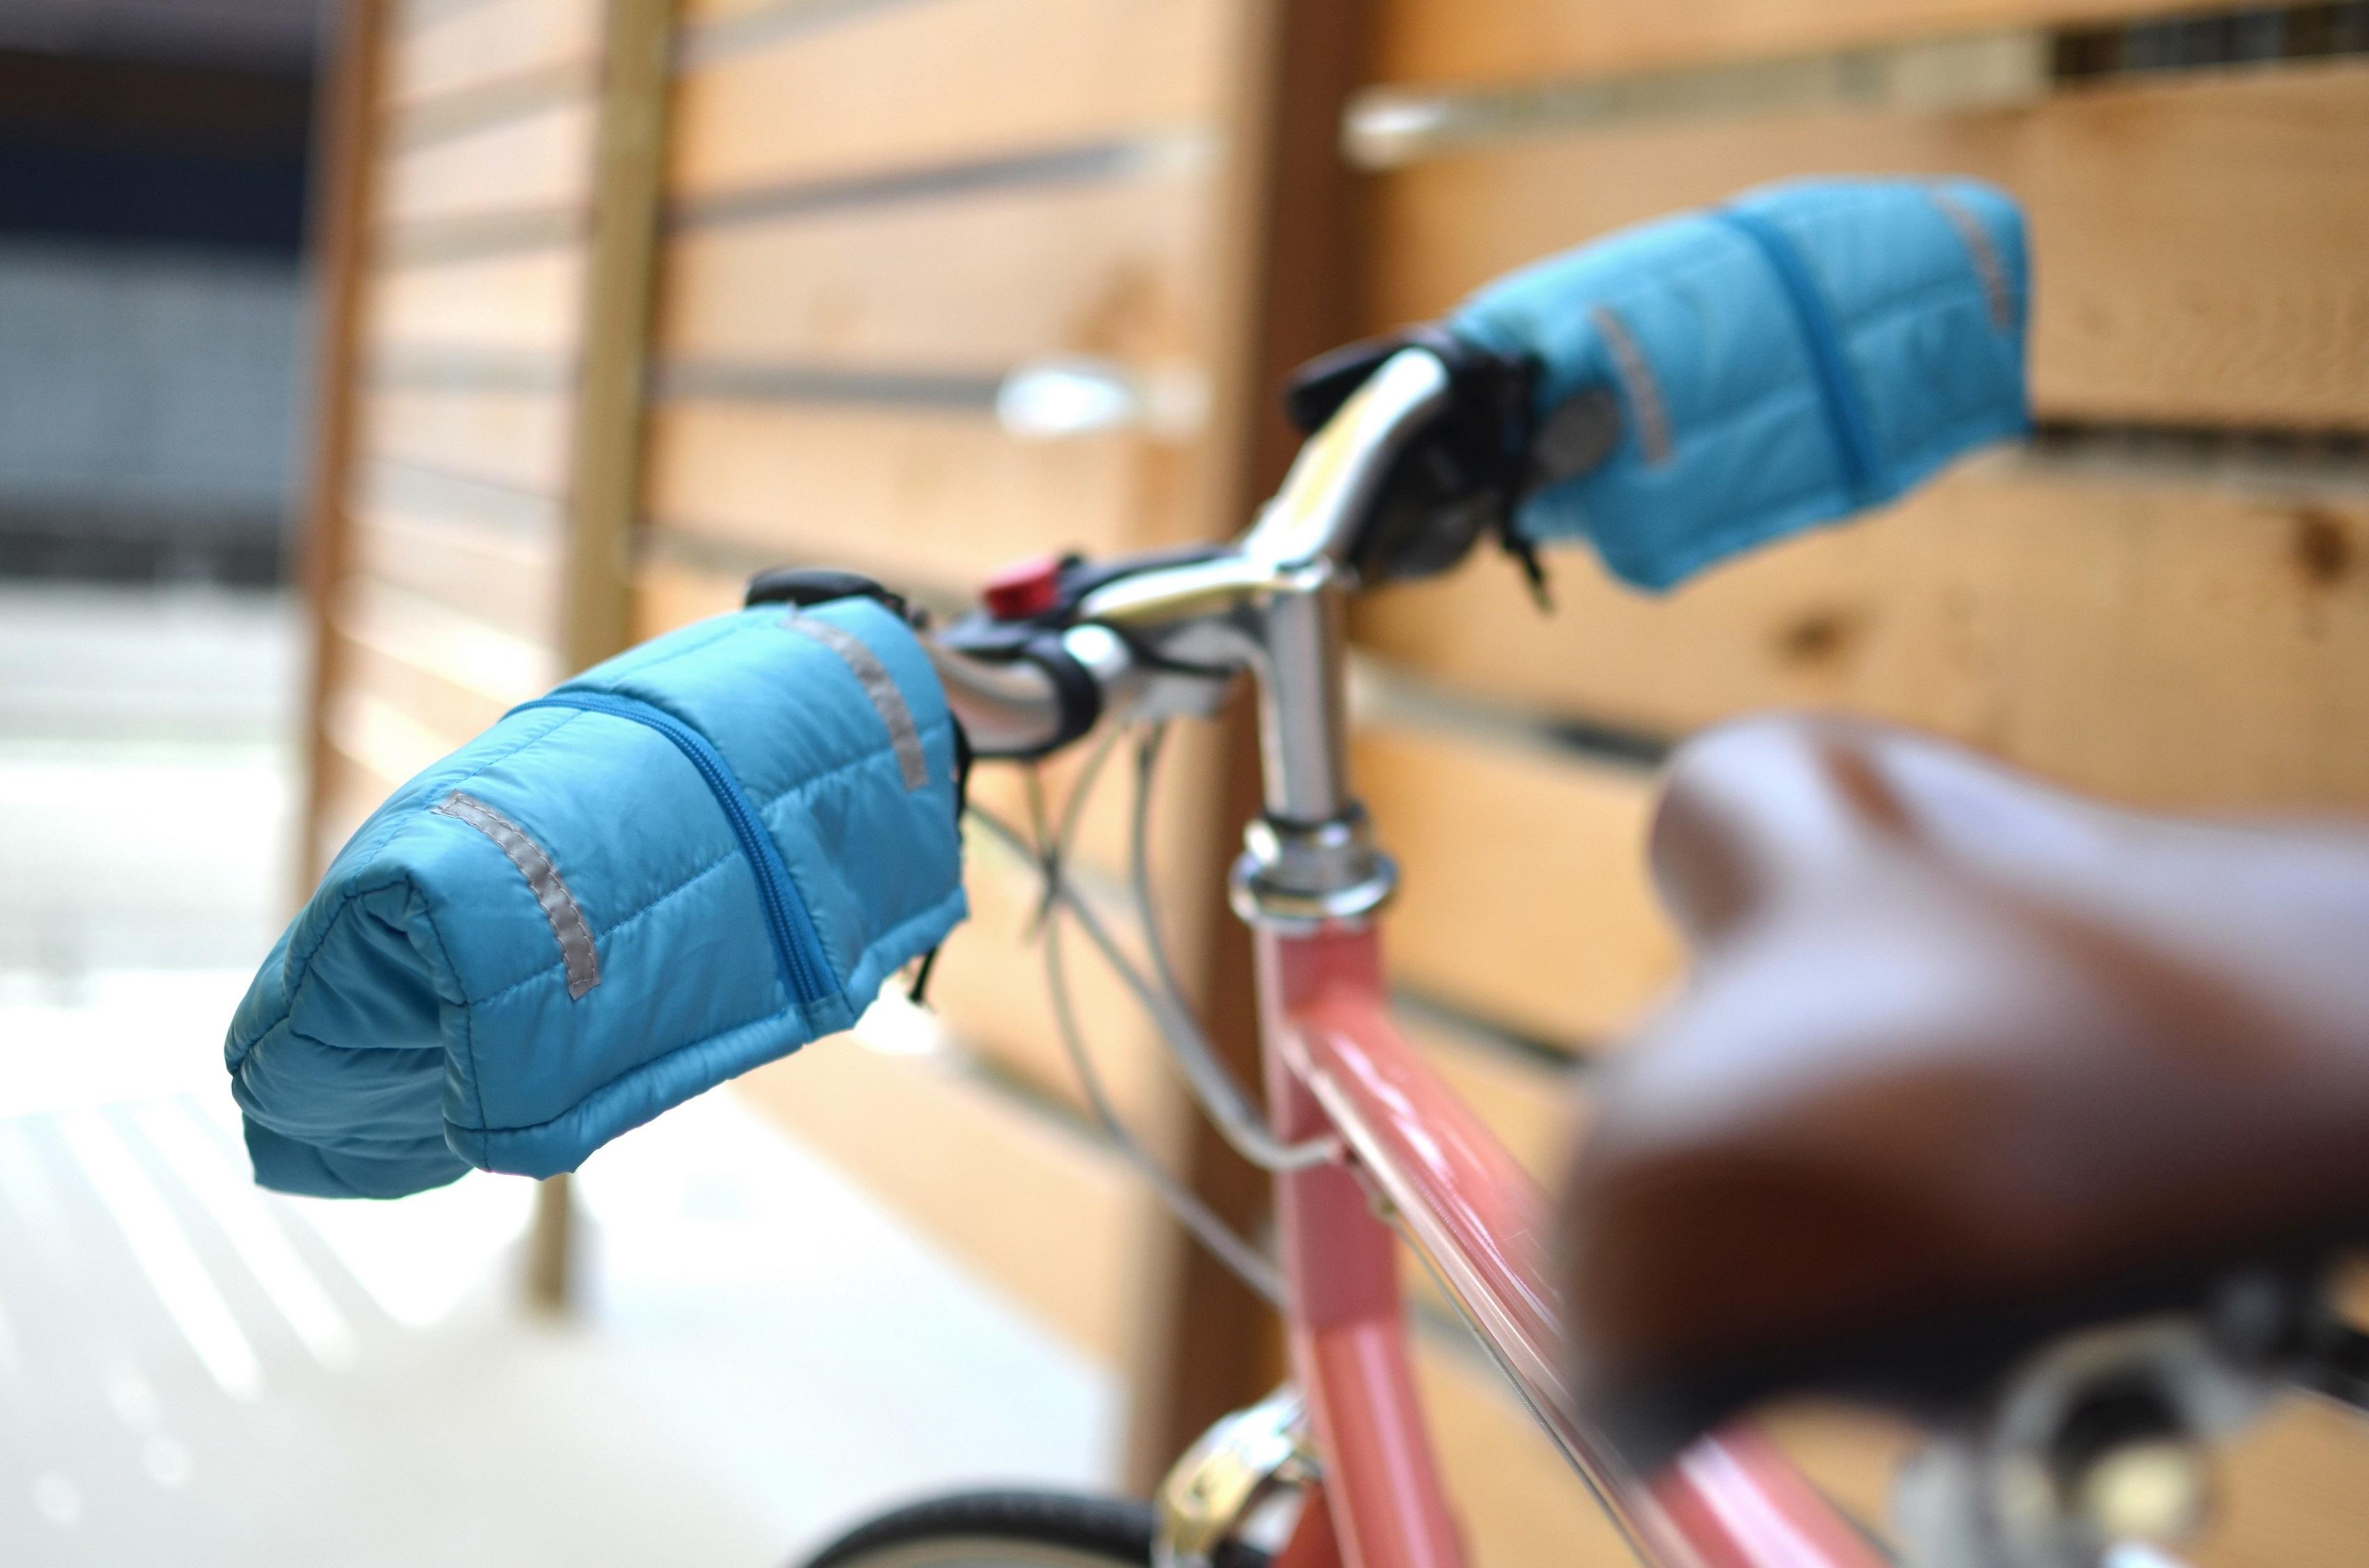 K4100 サイクルジャケット ハンドルカバー カーキ